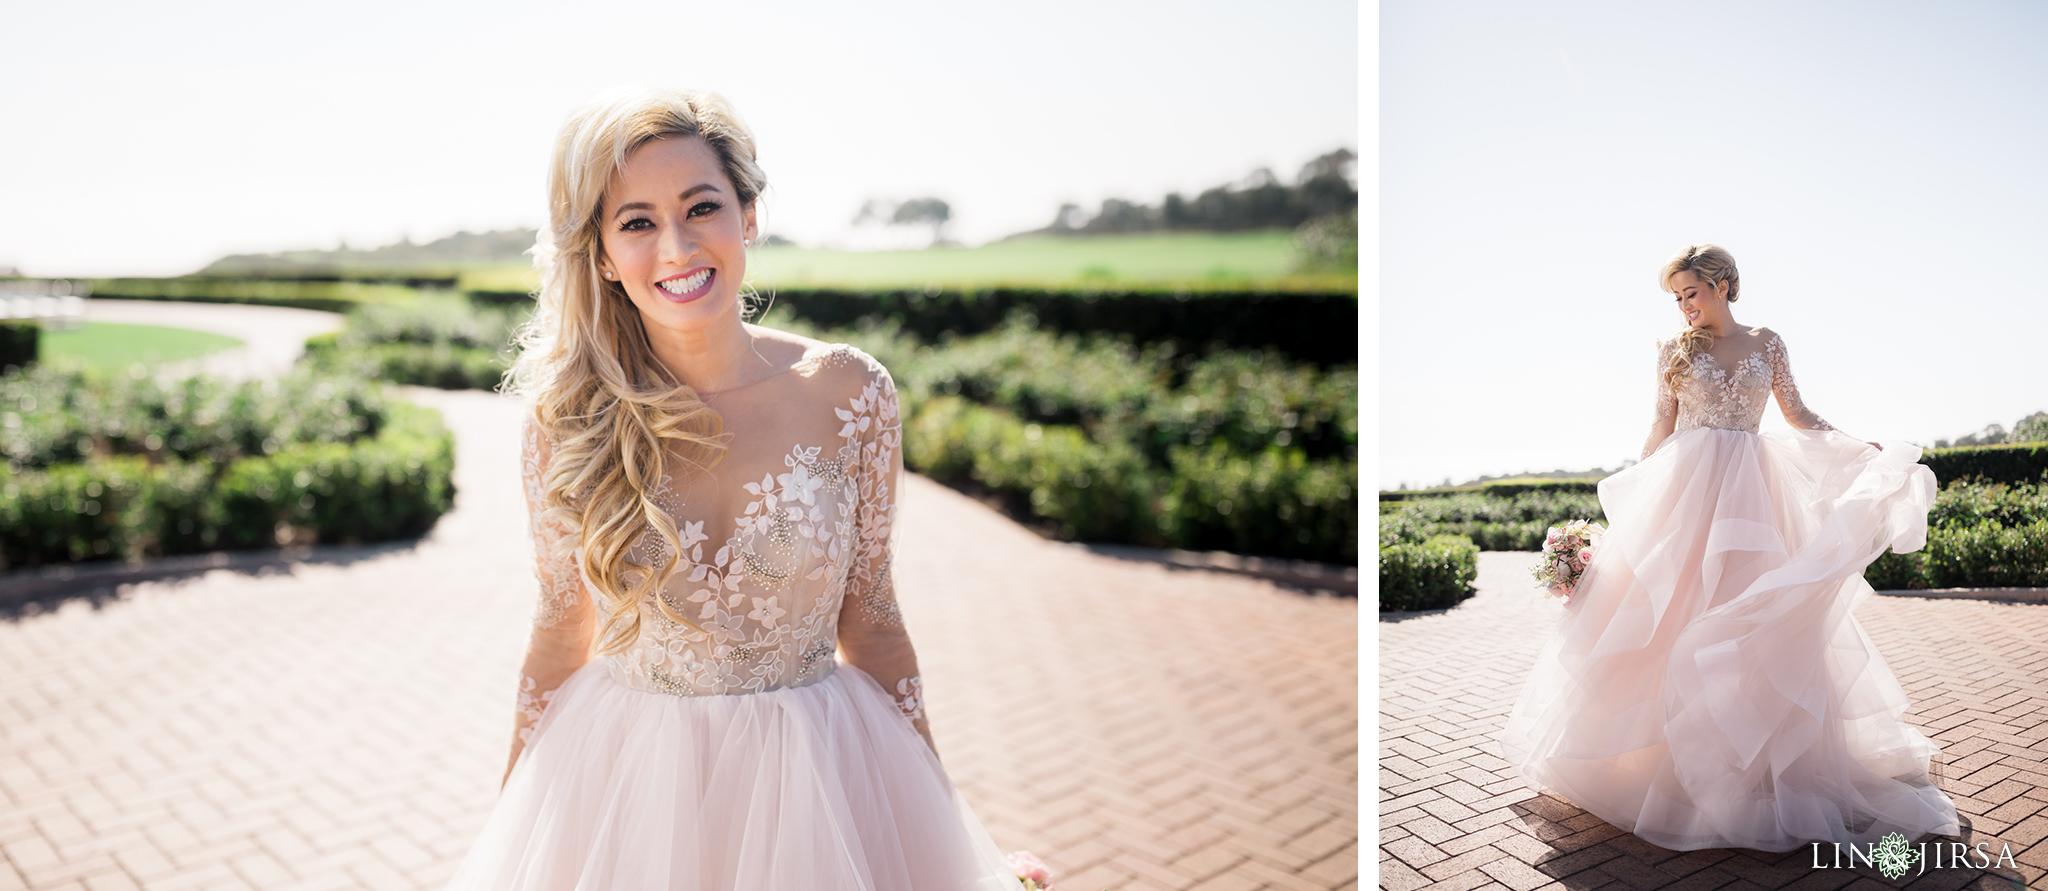 09-pelican-hill-resort-orange-county-wedding-photography